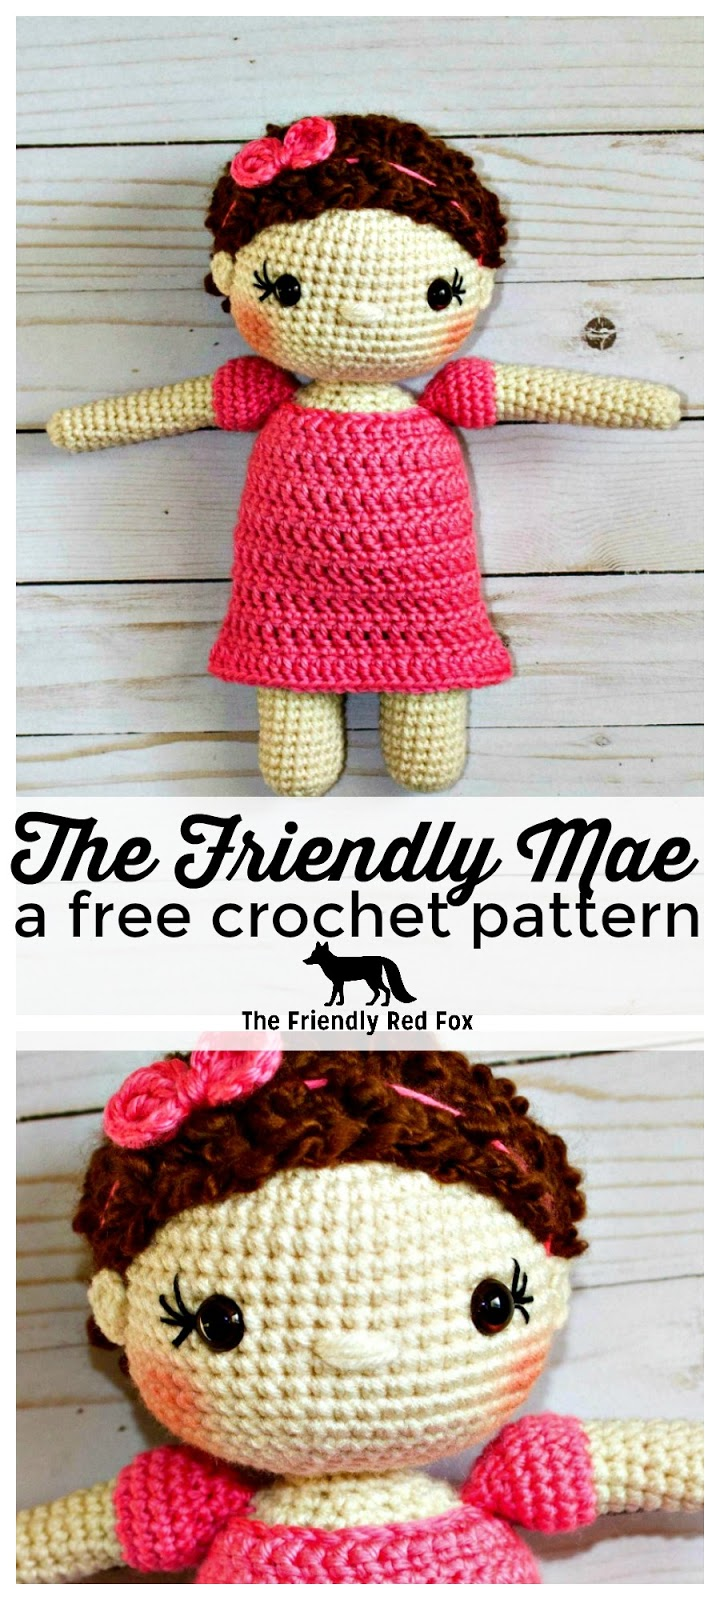 Free Crochet Doll Pattern- The Friendly Mae - thefriendlyredfox.com